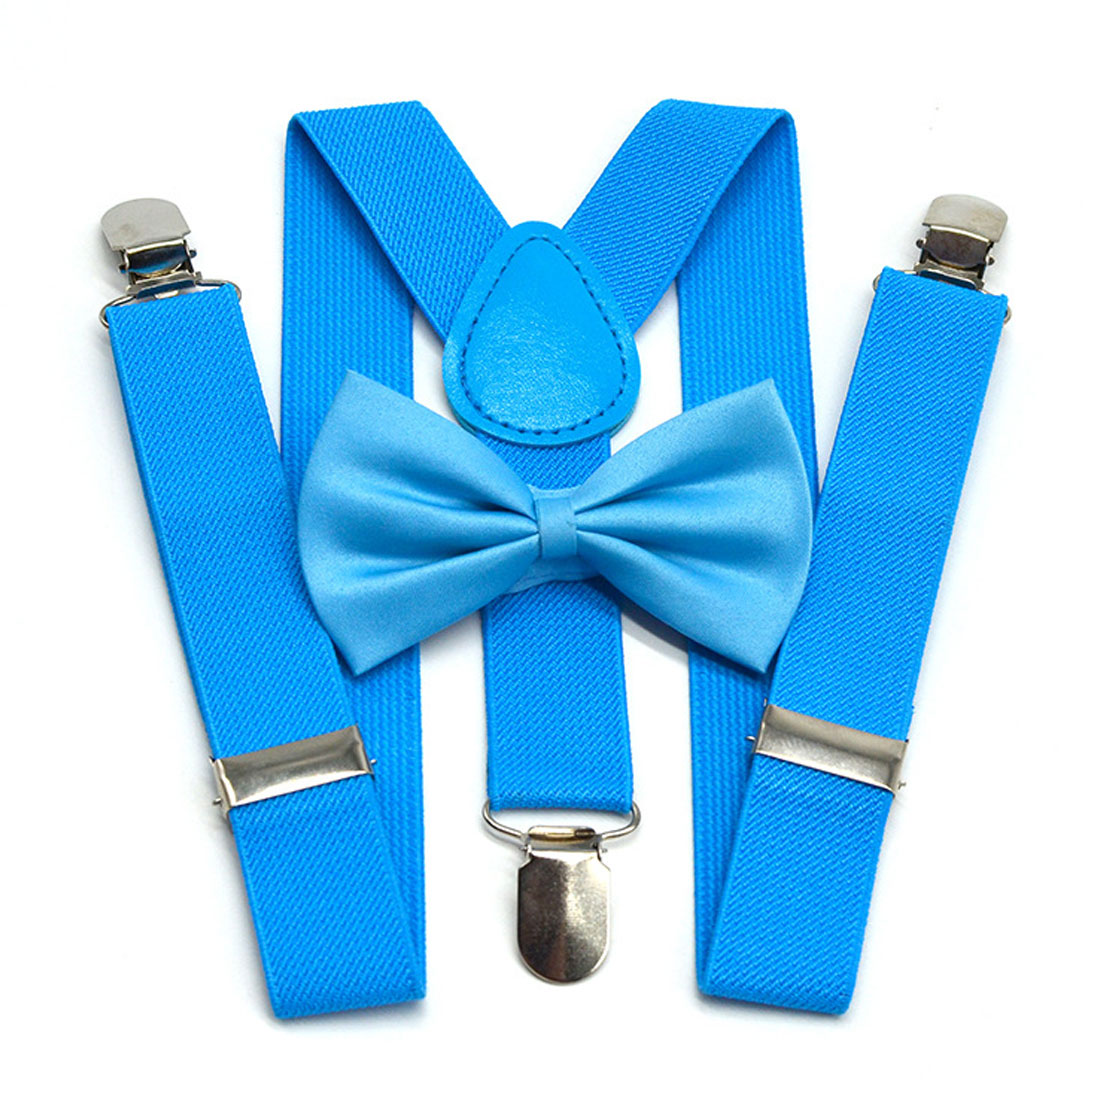 Children Belt Cool  Bow Tie Set Baby Boys Girls Suspenders Clip-on Y-Back Braces Bow Tie Elastic Kids Adjustable